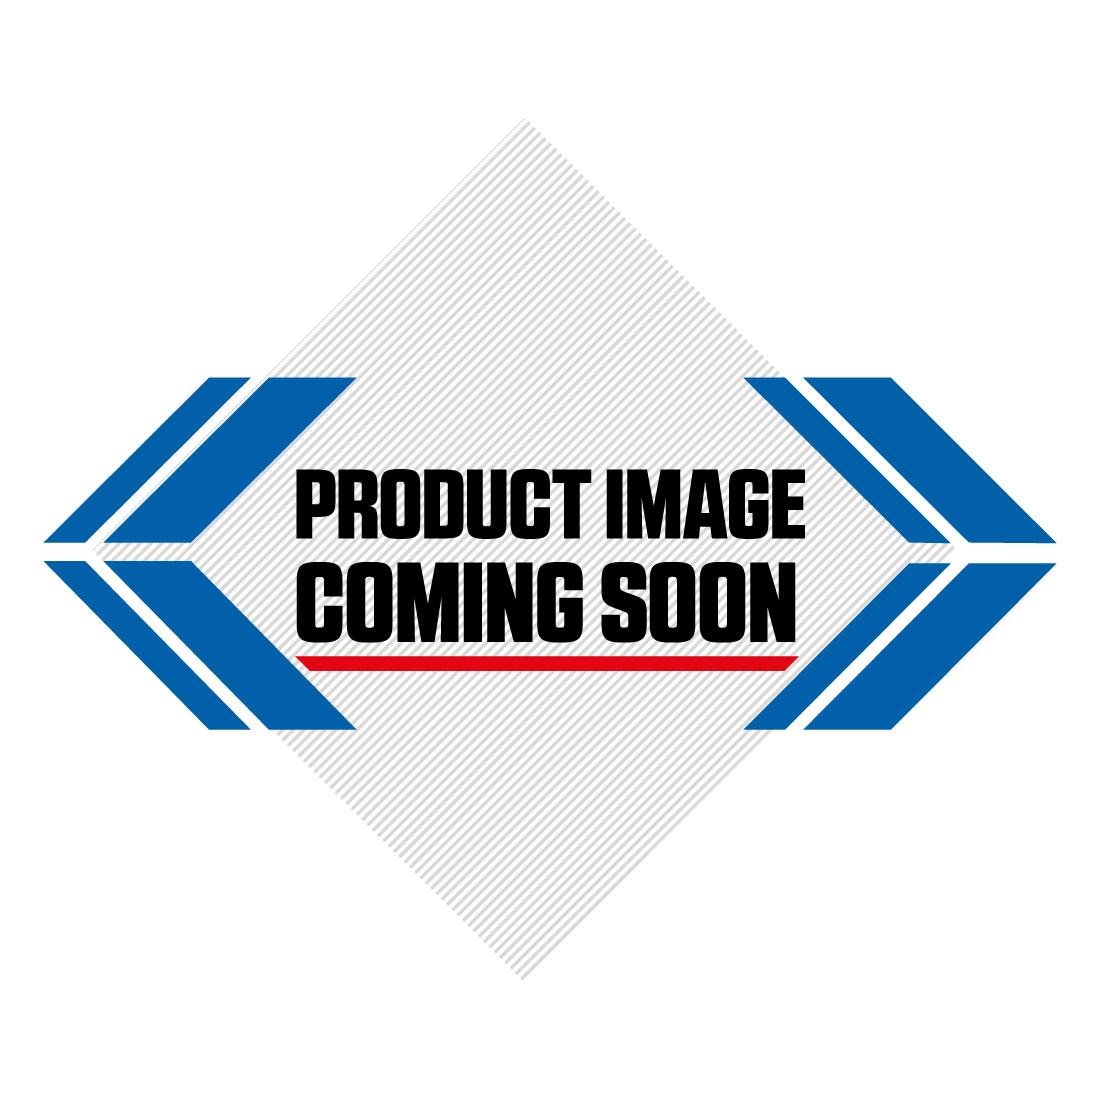 DJI Mavic 2 Pro Drone Image-5>